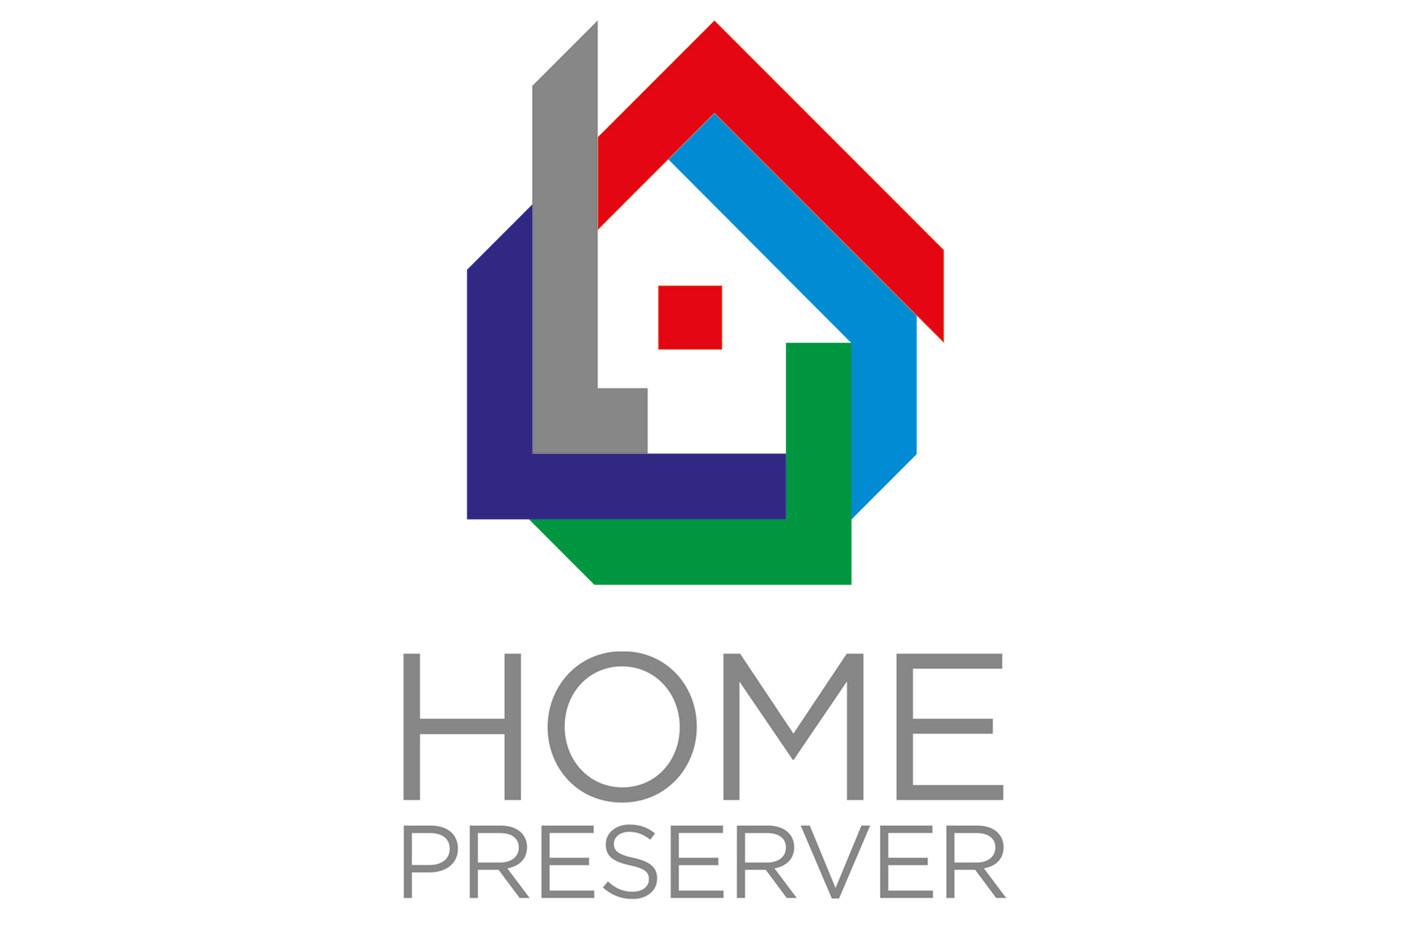 Home-Preserver-Logo-Portrait.jpg